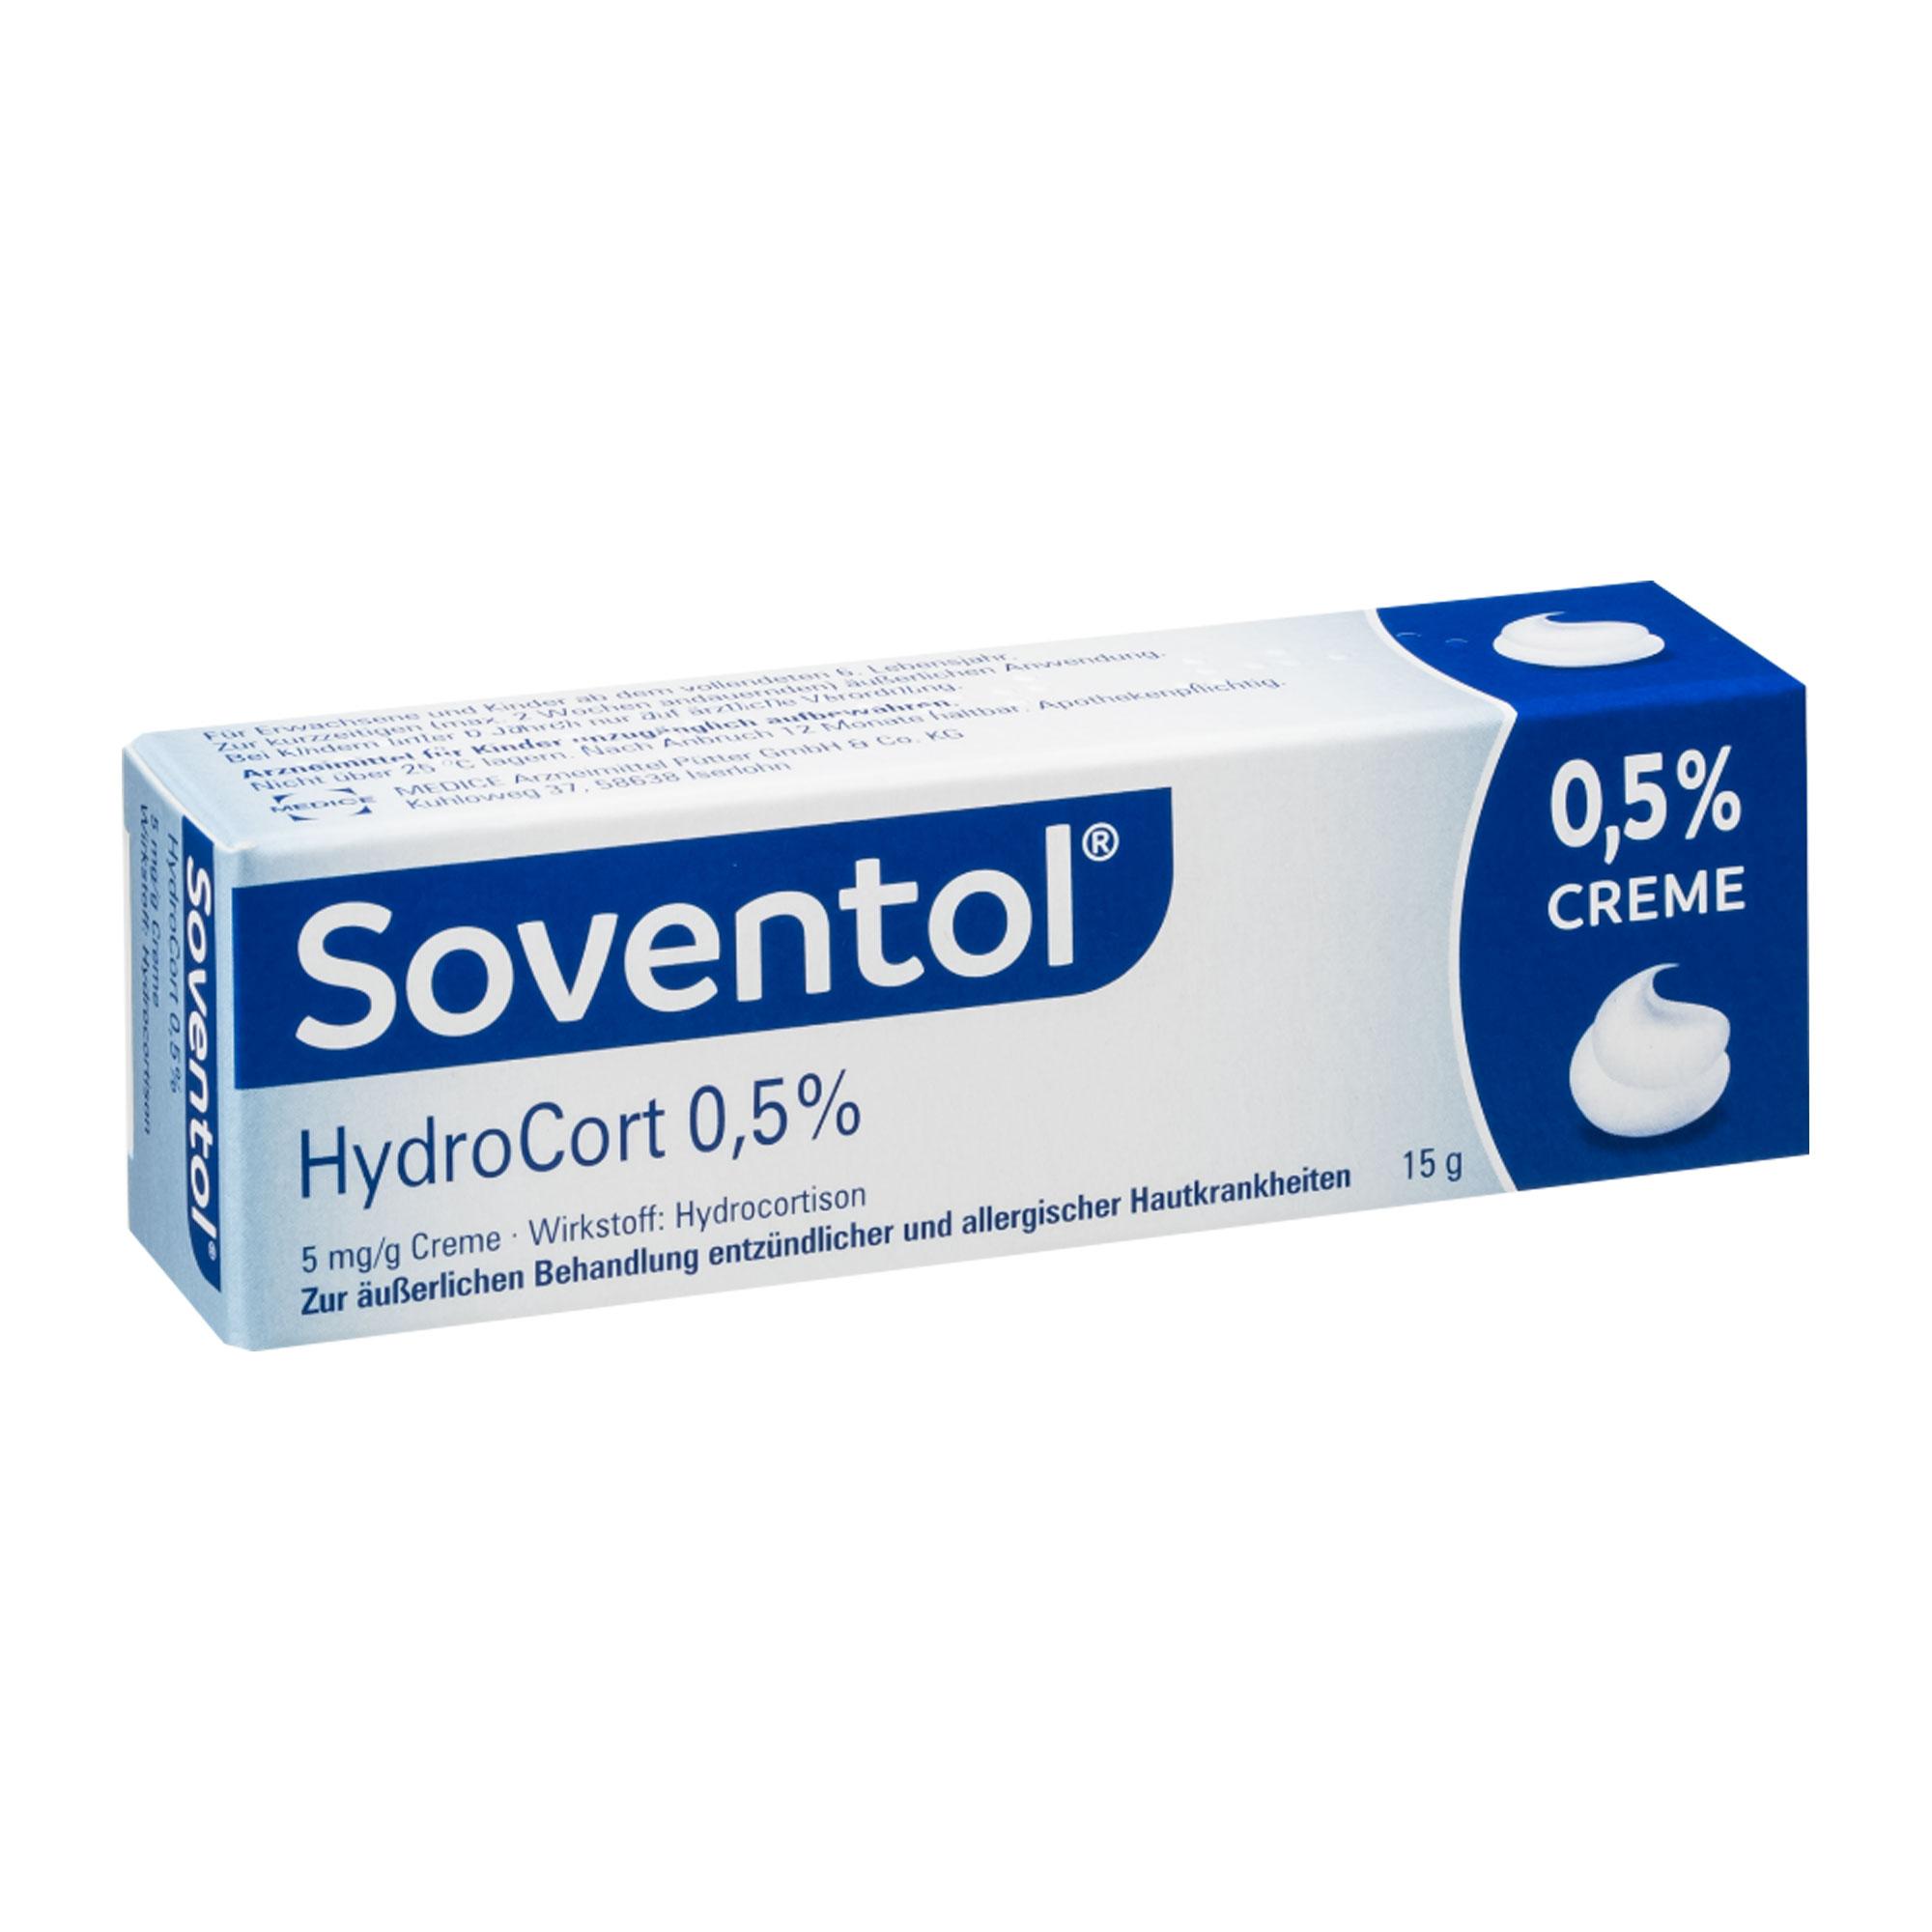 Soventol Hydrocort 0,5% Creme